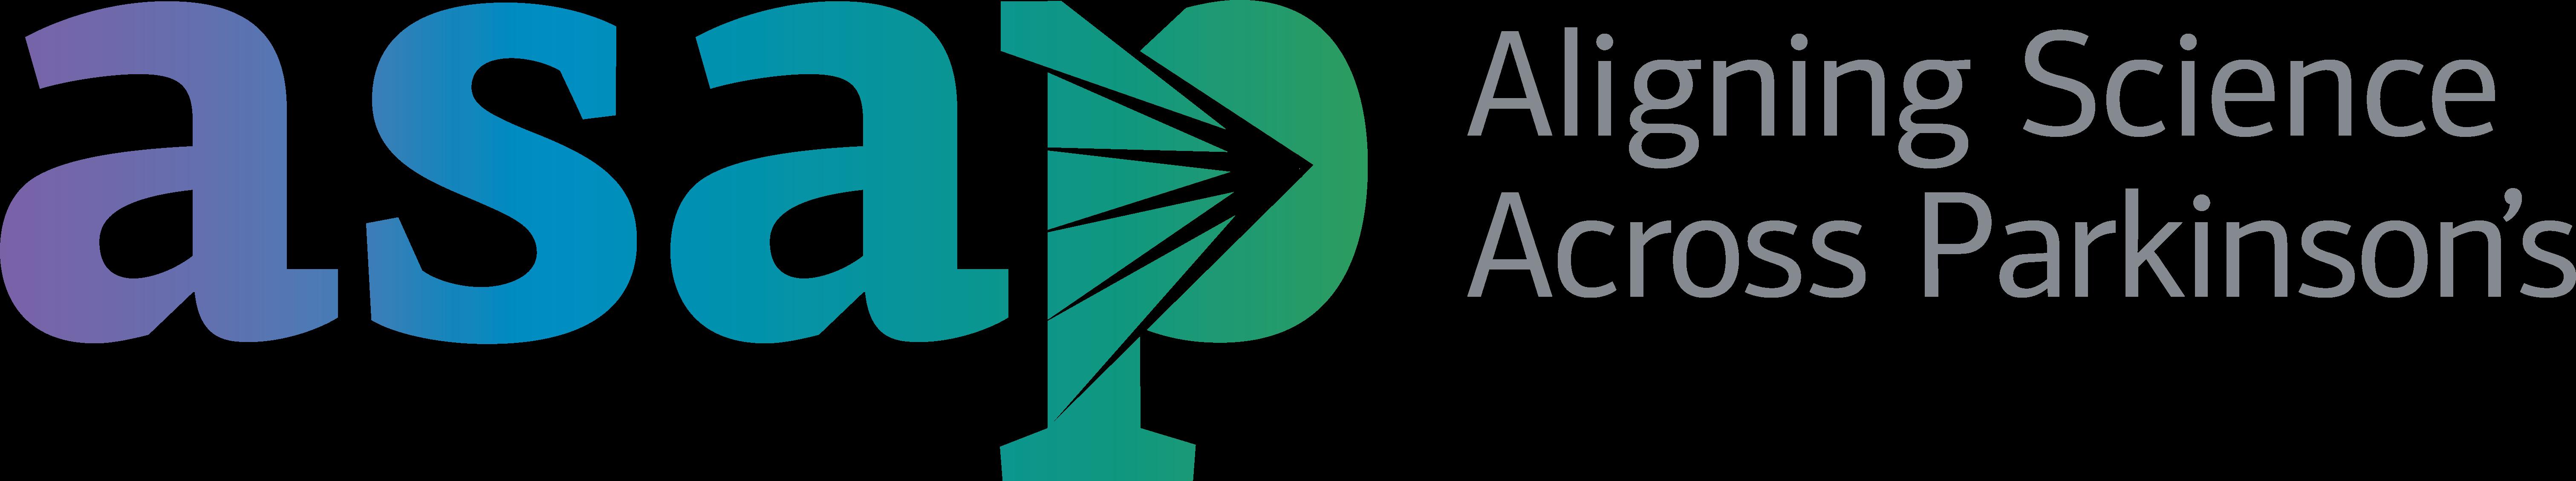 Aligning Science across parkinson's logo